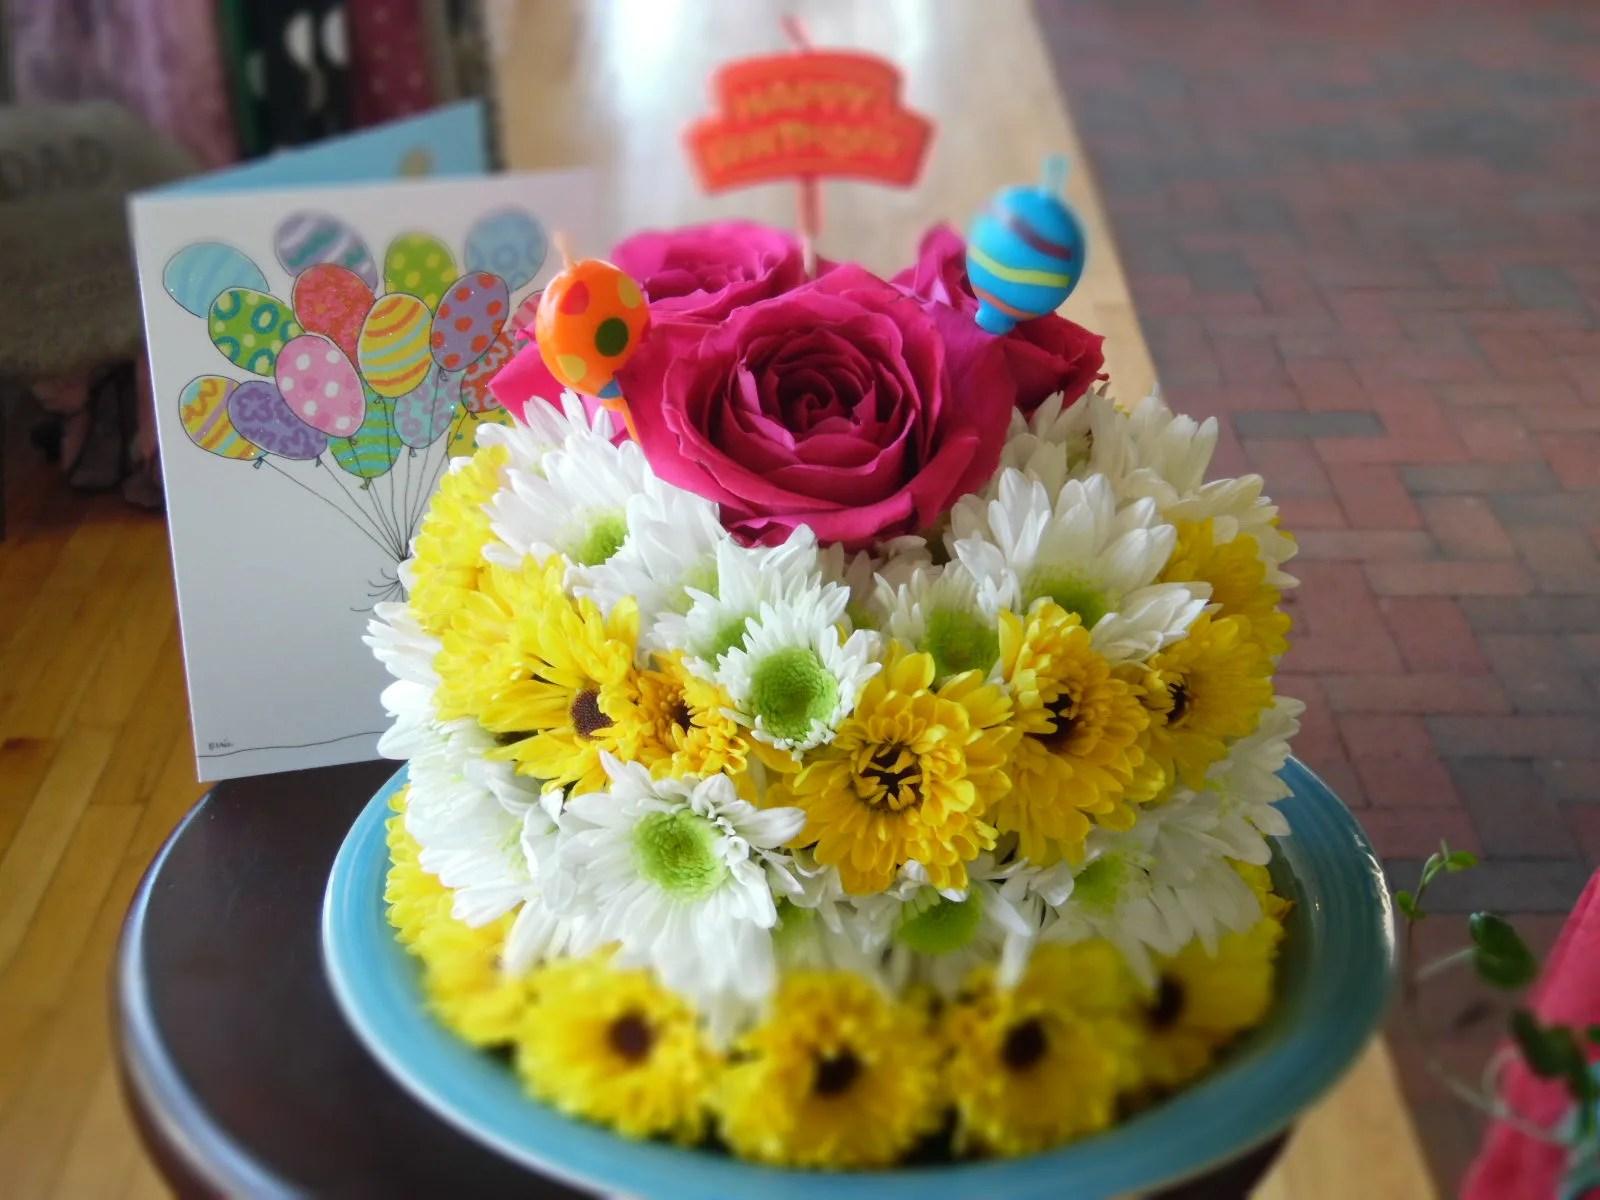 Happy Happy Birthday Cake In Leavenworth Ks Leavenworth Floral